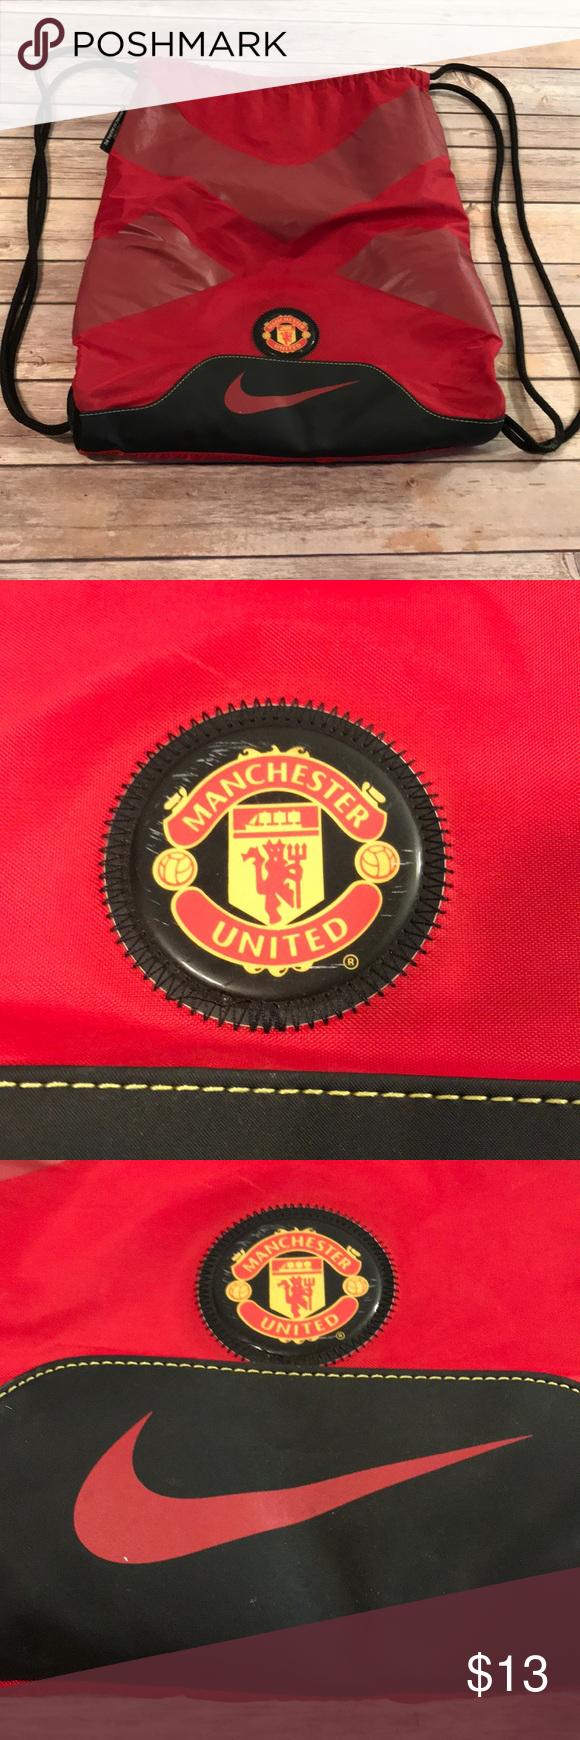 Nike Manchester United drawstring bag (With images) Nike